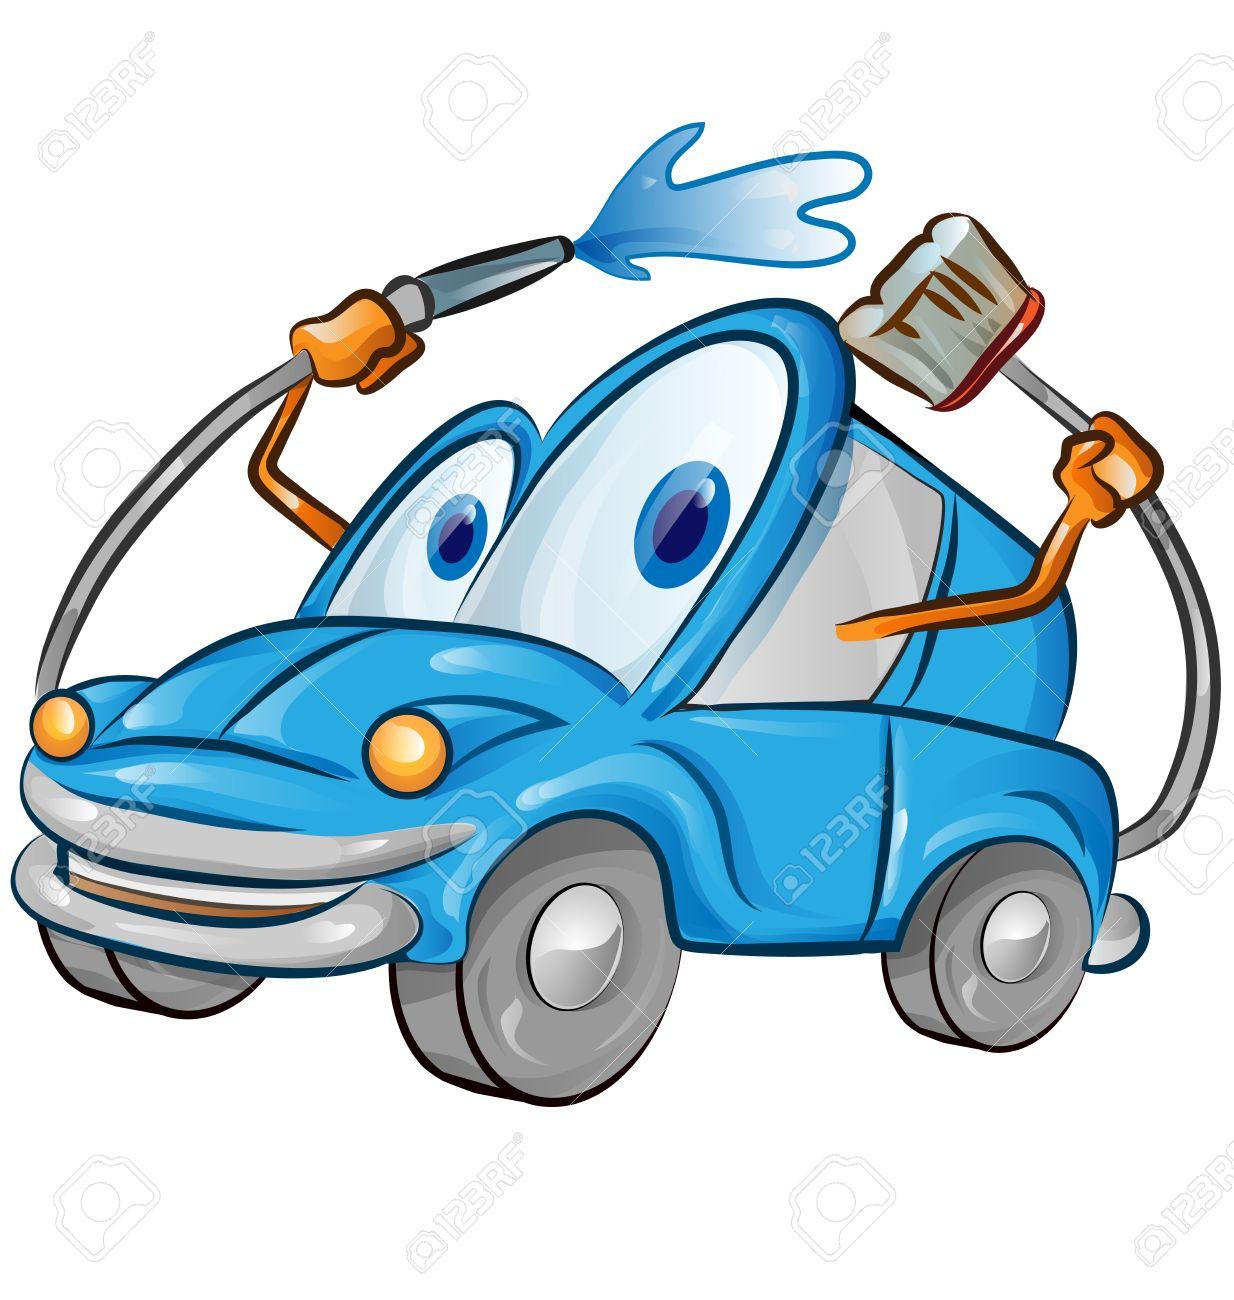 car wash cartoon royalty free cliparts vectors and stock rh 123rf com free car wash clip art images free car wash clipart